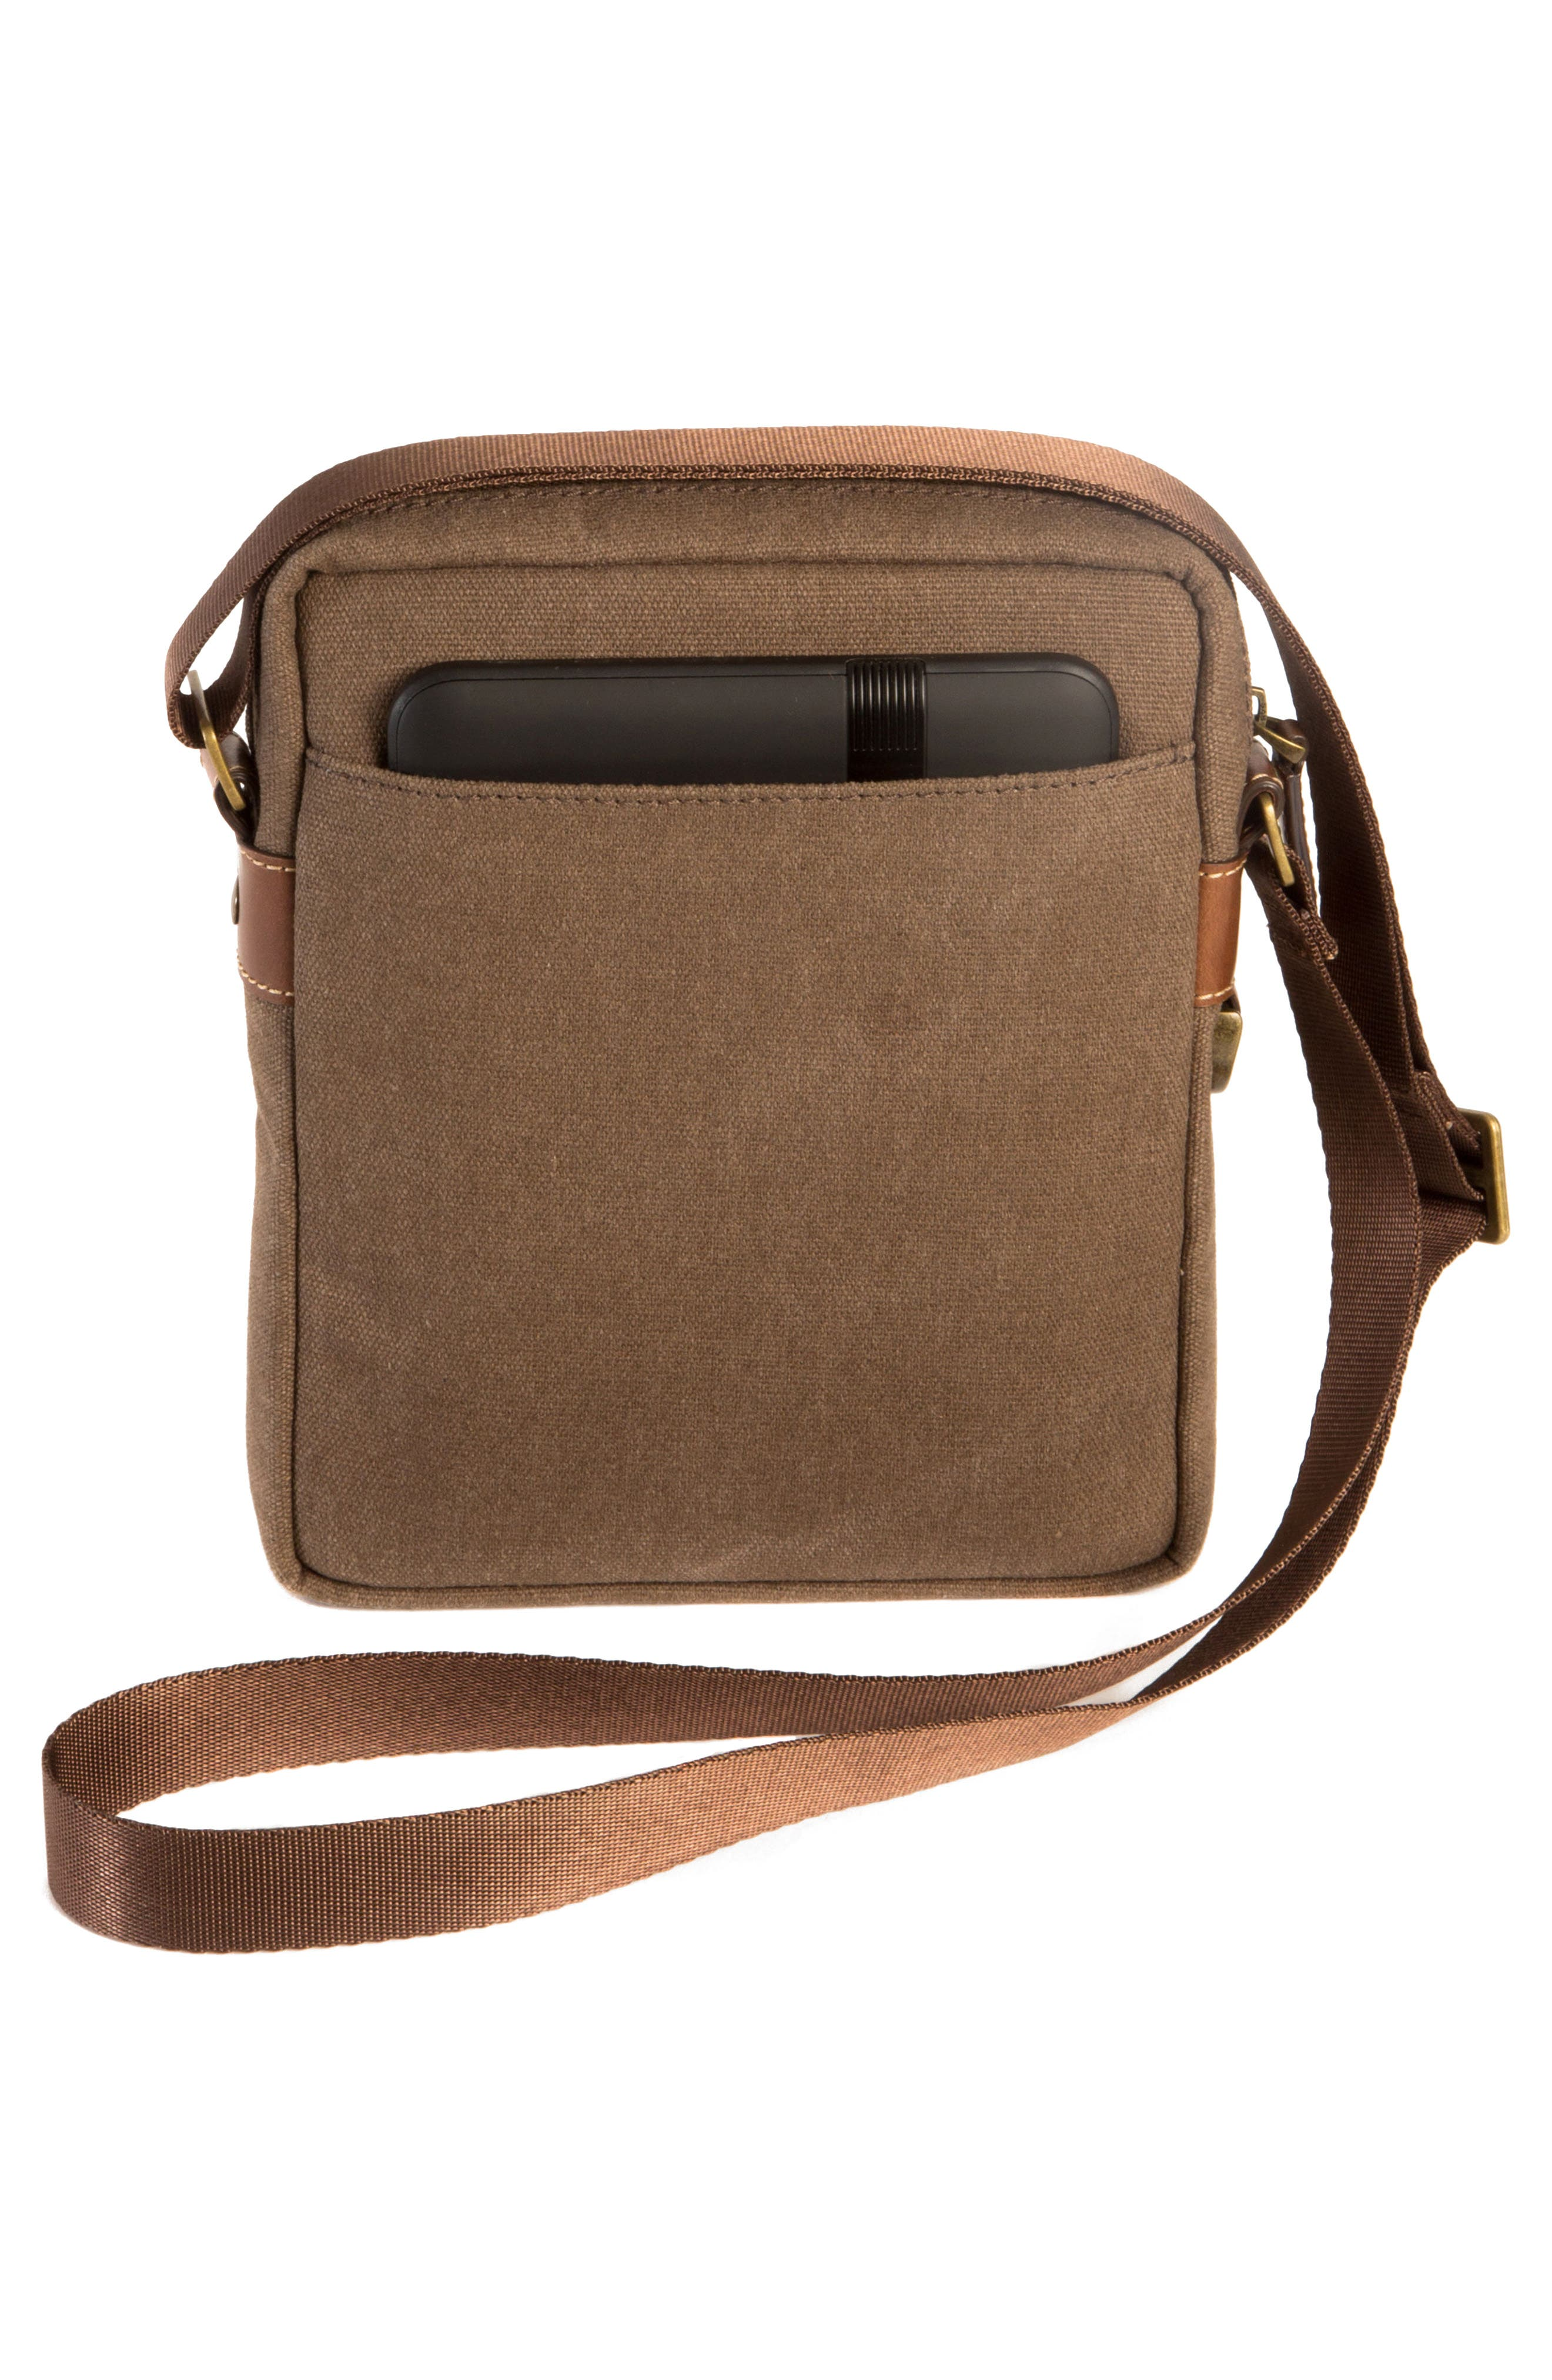 Bryant Crossbody Bag,                             Alternate thumbnail 2, color,                             MAHOGANY AND HEATHER